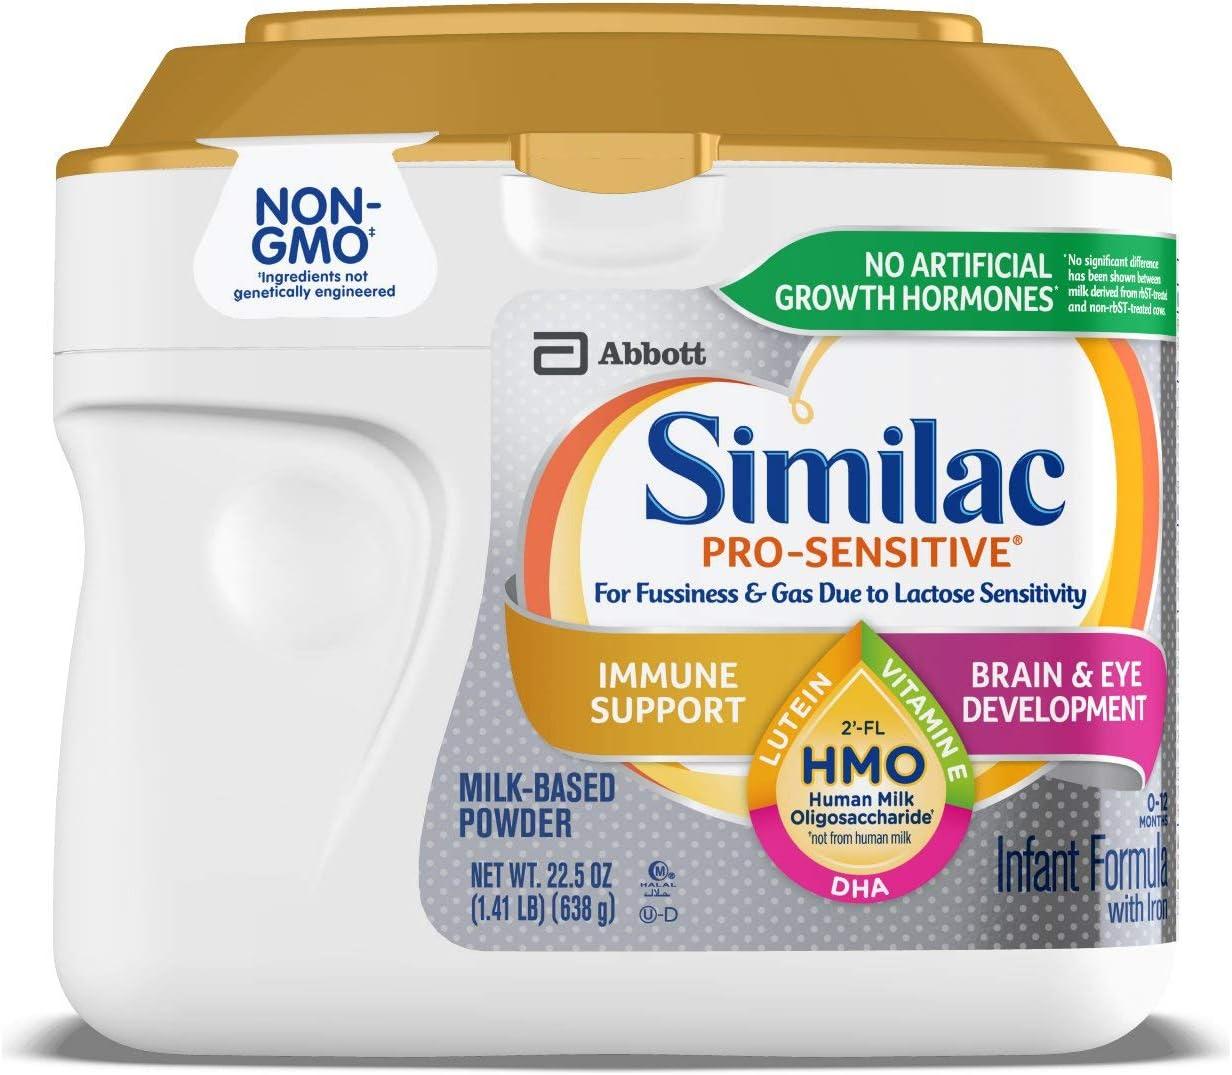 Similac Pro-Sensitive Infant Formula With 2'-Fl Human Milk Oligosaccharide (hmo) for Immune...